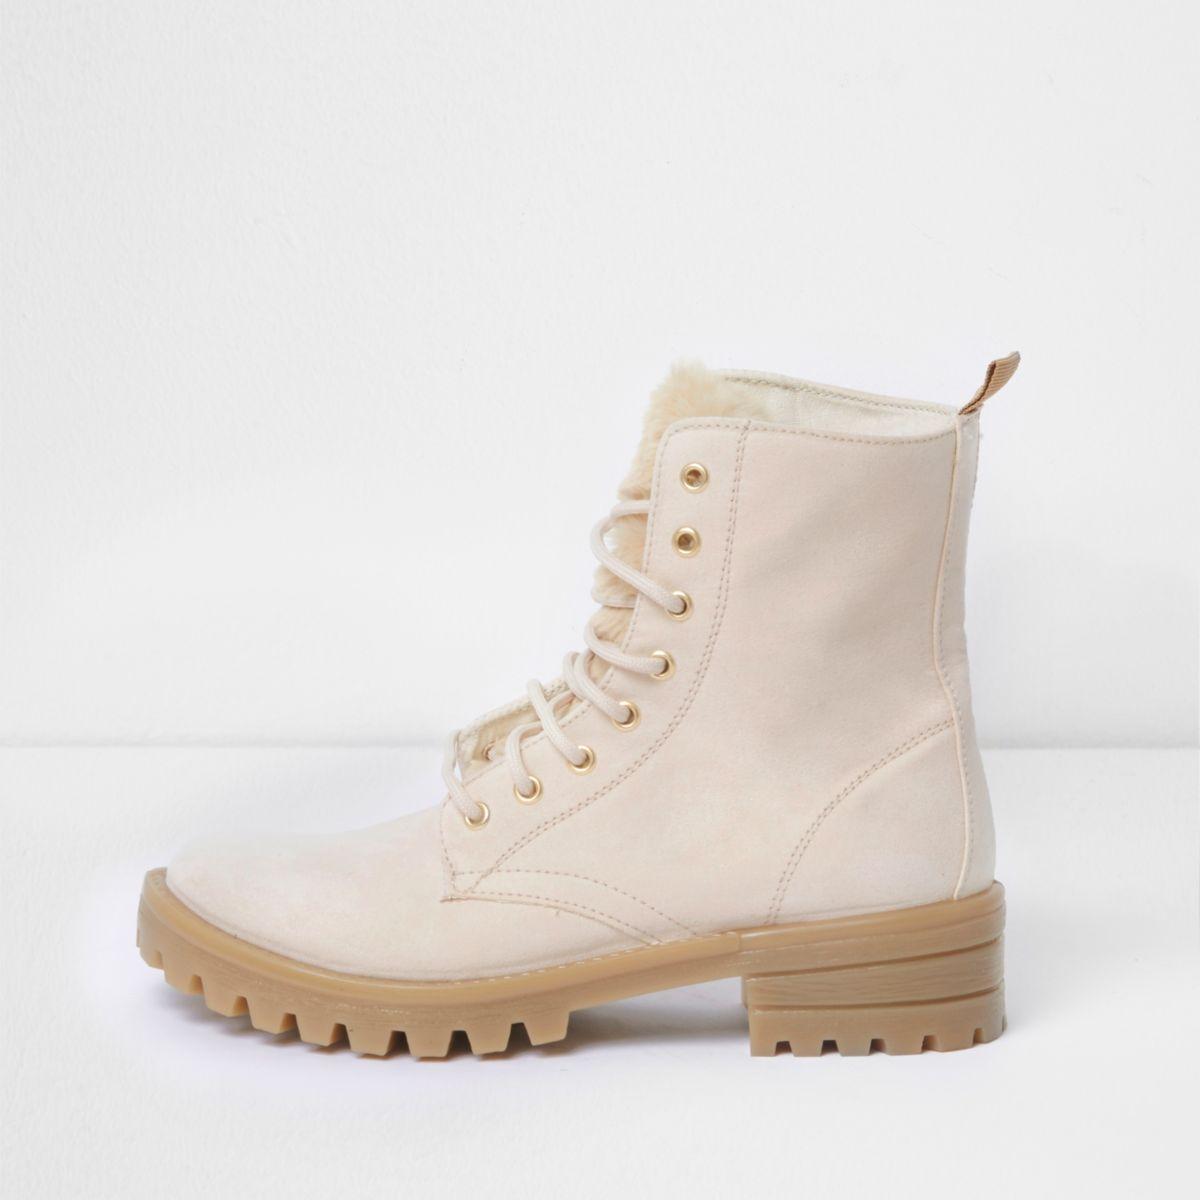 Cream faux fur tongue lace-up boots